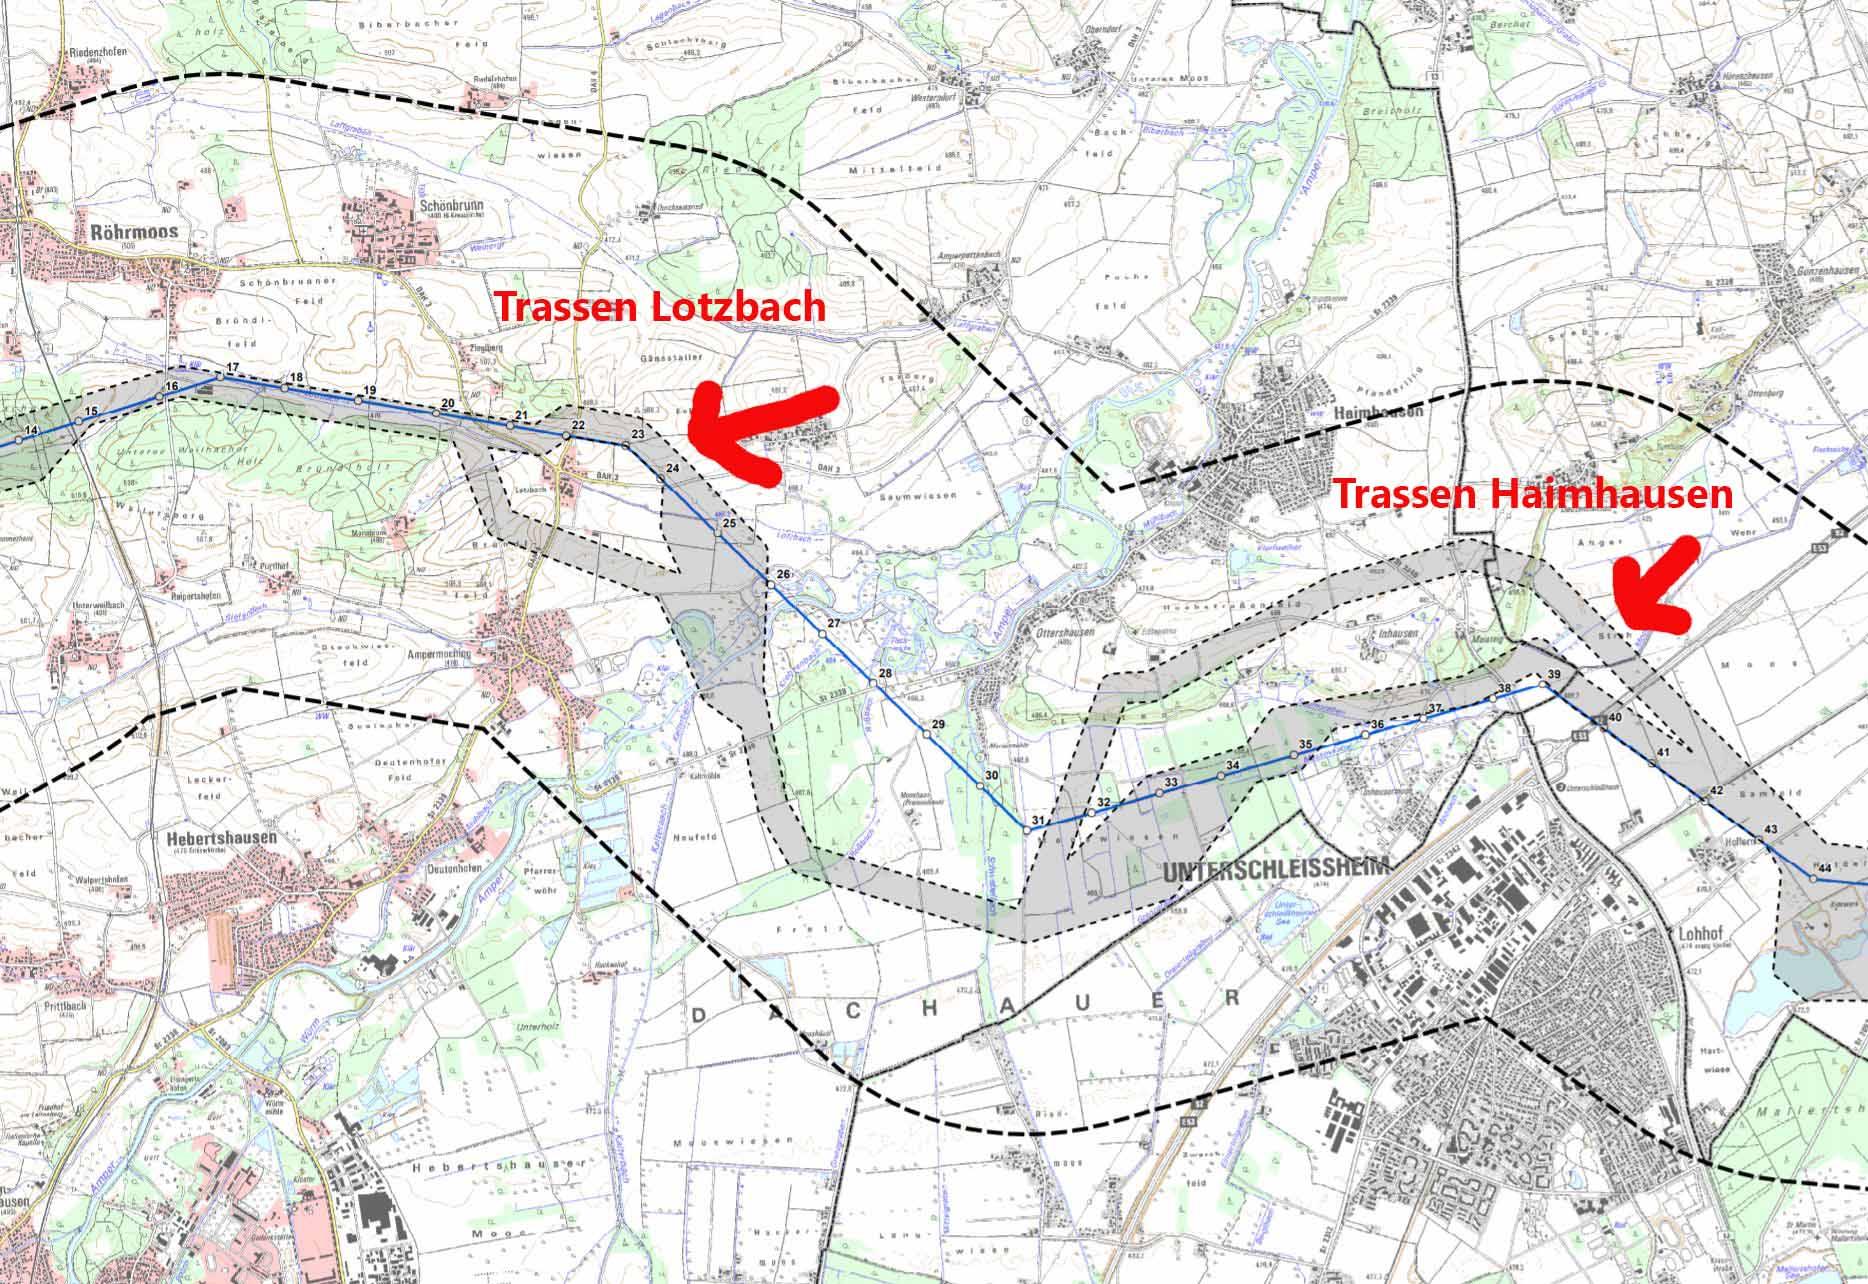 Tennet Trassen Lotzbach Haimhausen 2